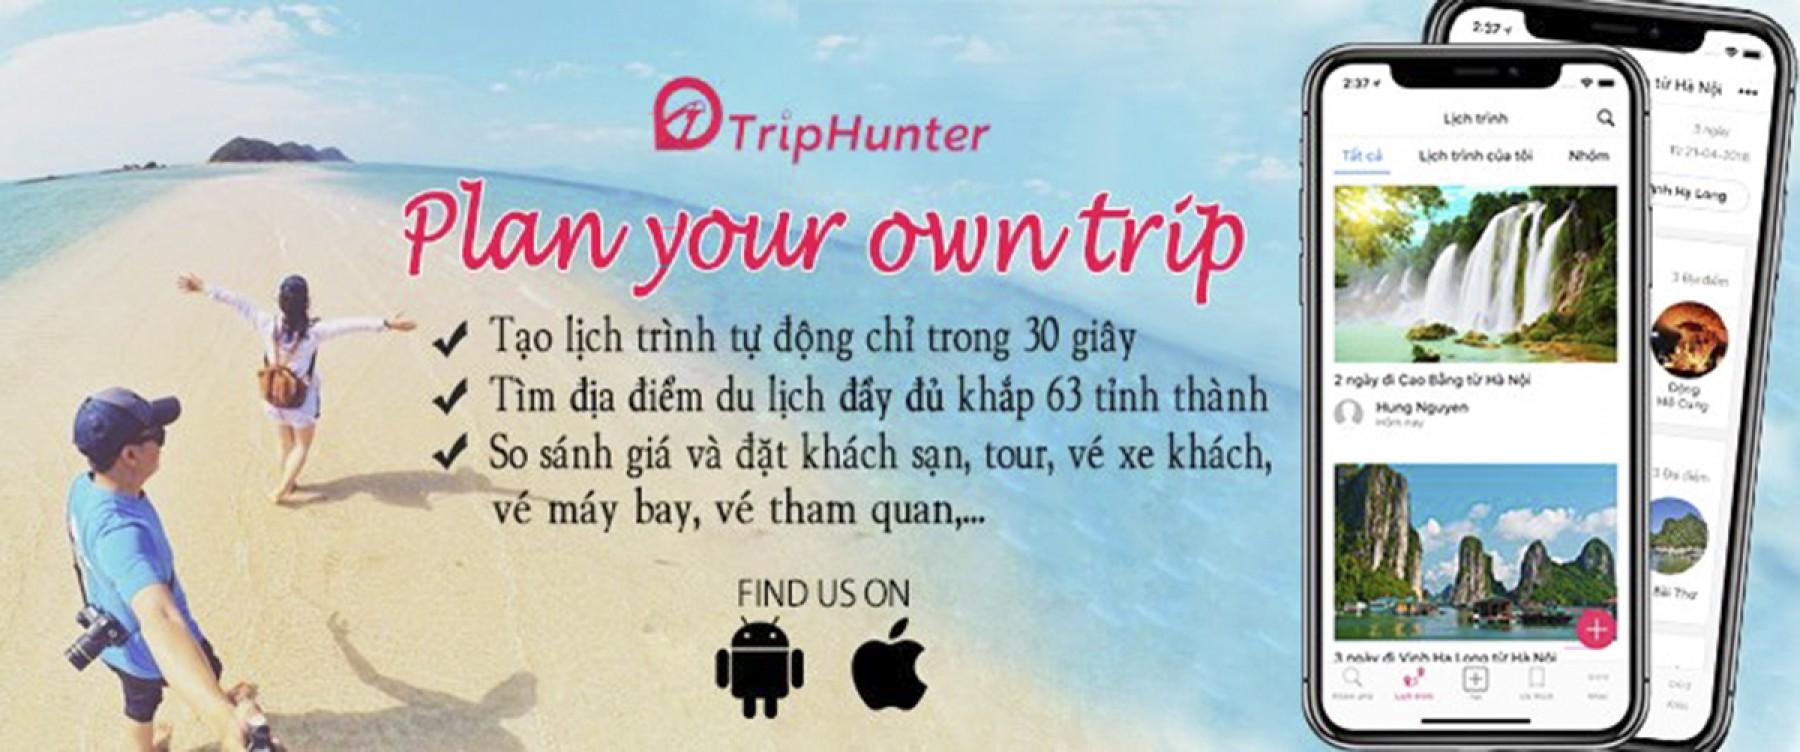 triphunter-11.jpg